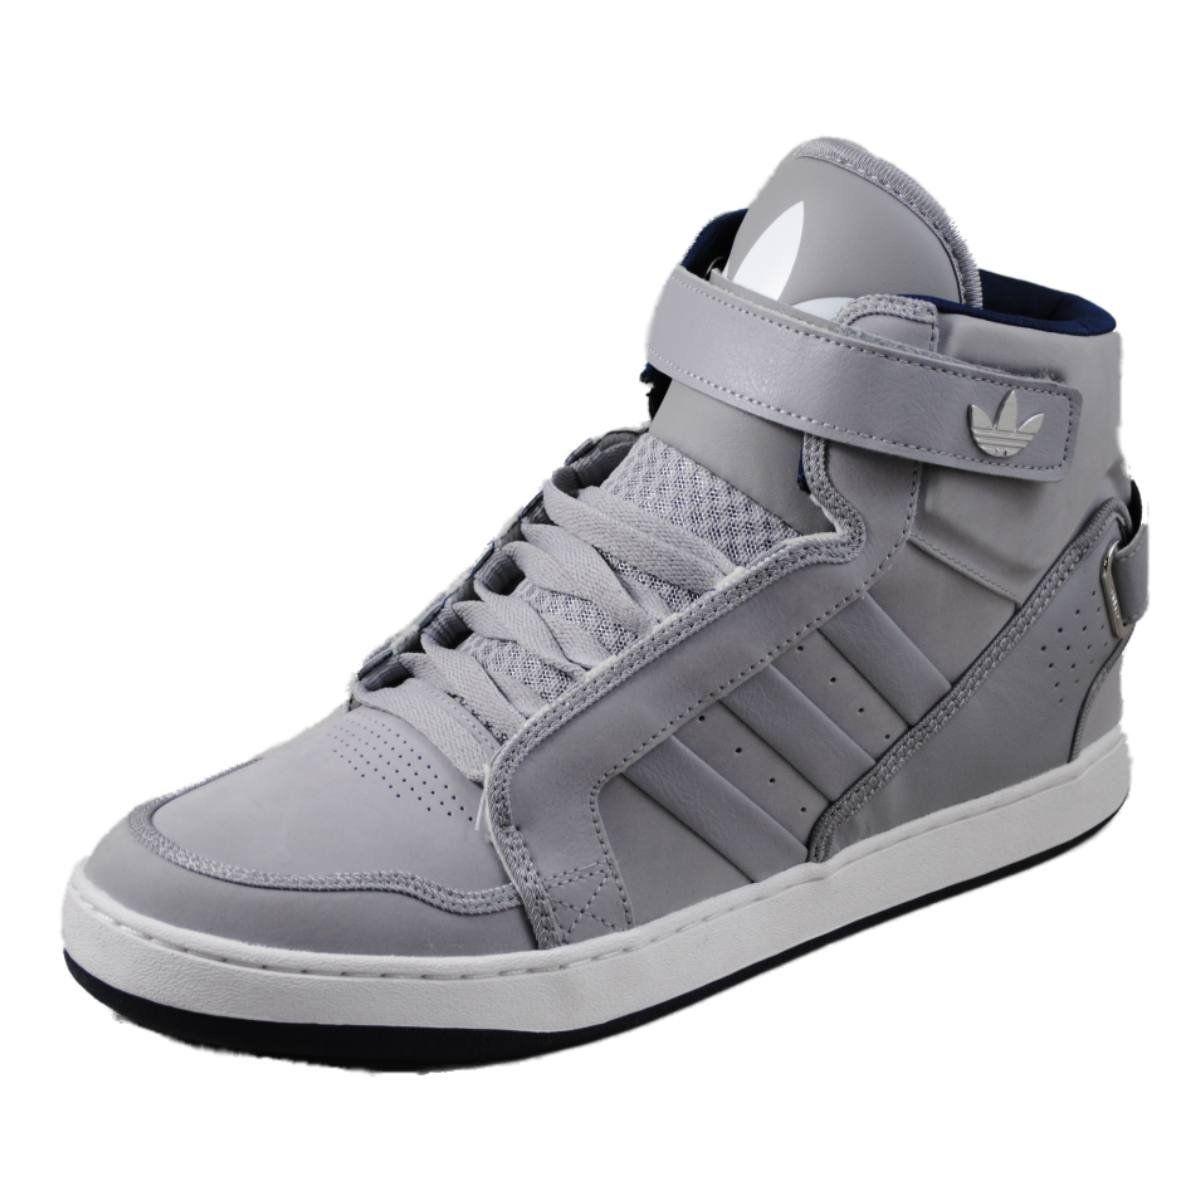 adidas Men's The AR 3.0 Sneaker